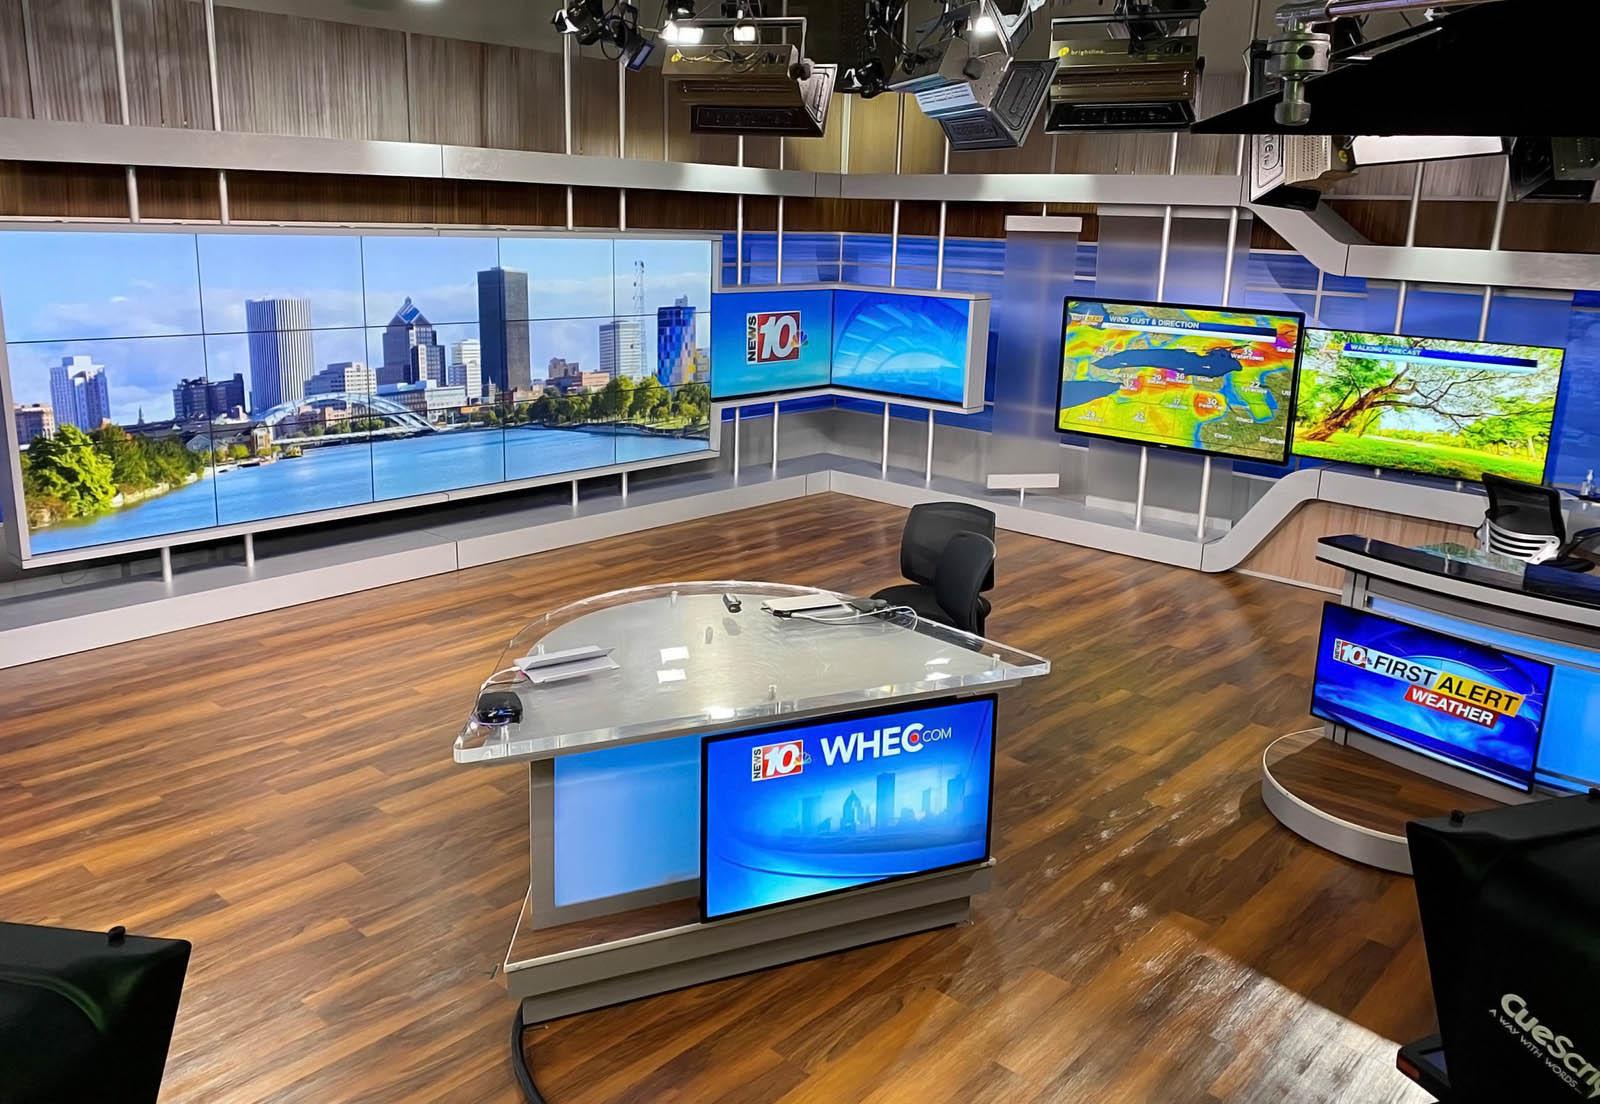 WHEC 10 News live broadcasting studio